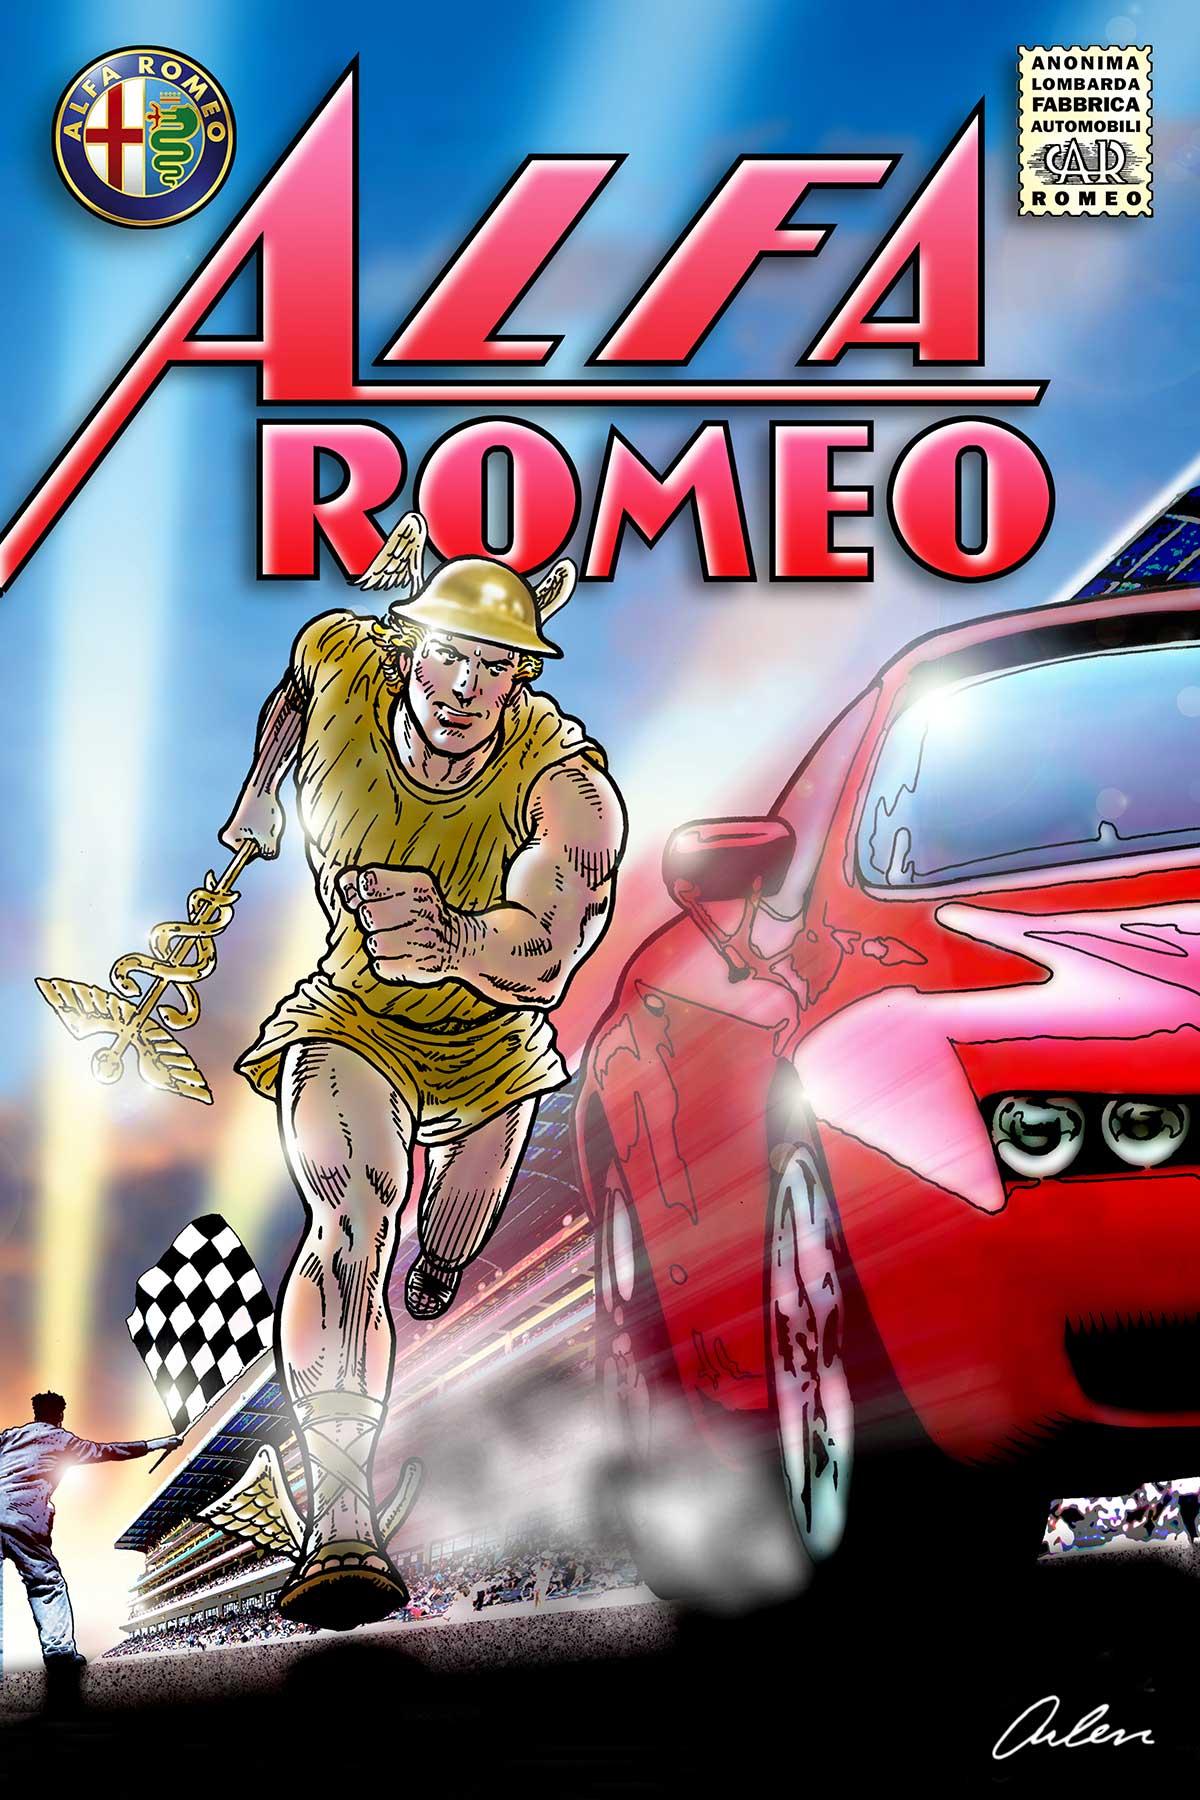 Arlen Schumer / Alfa Romeo Poster / Competition